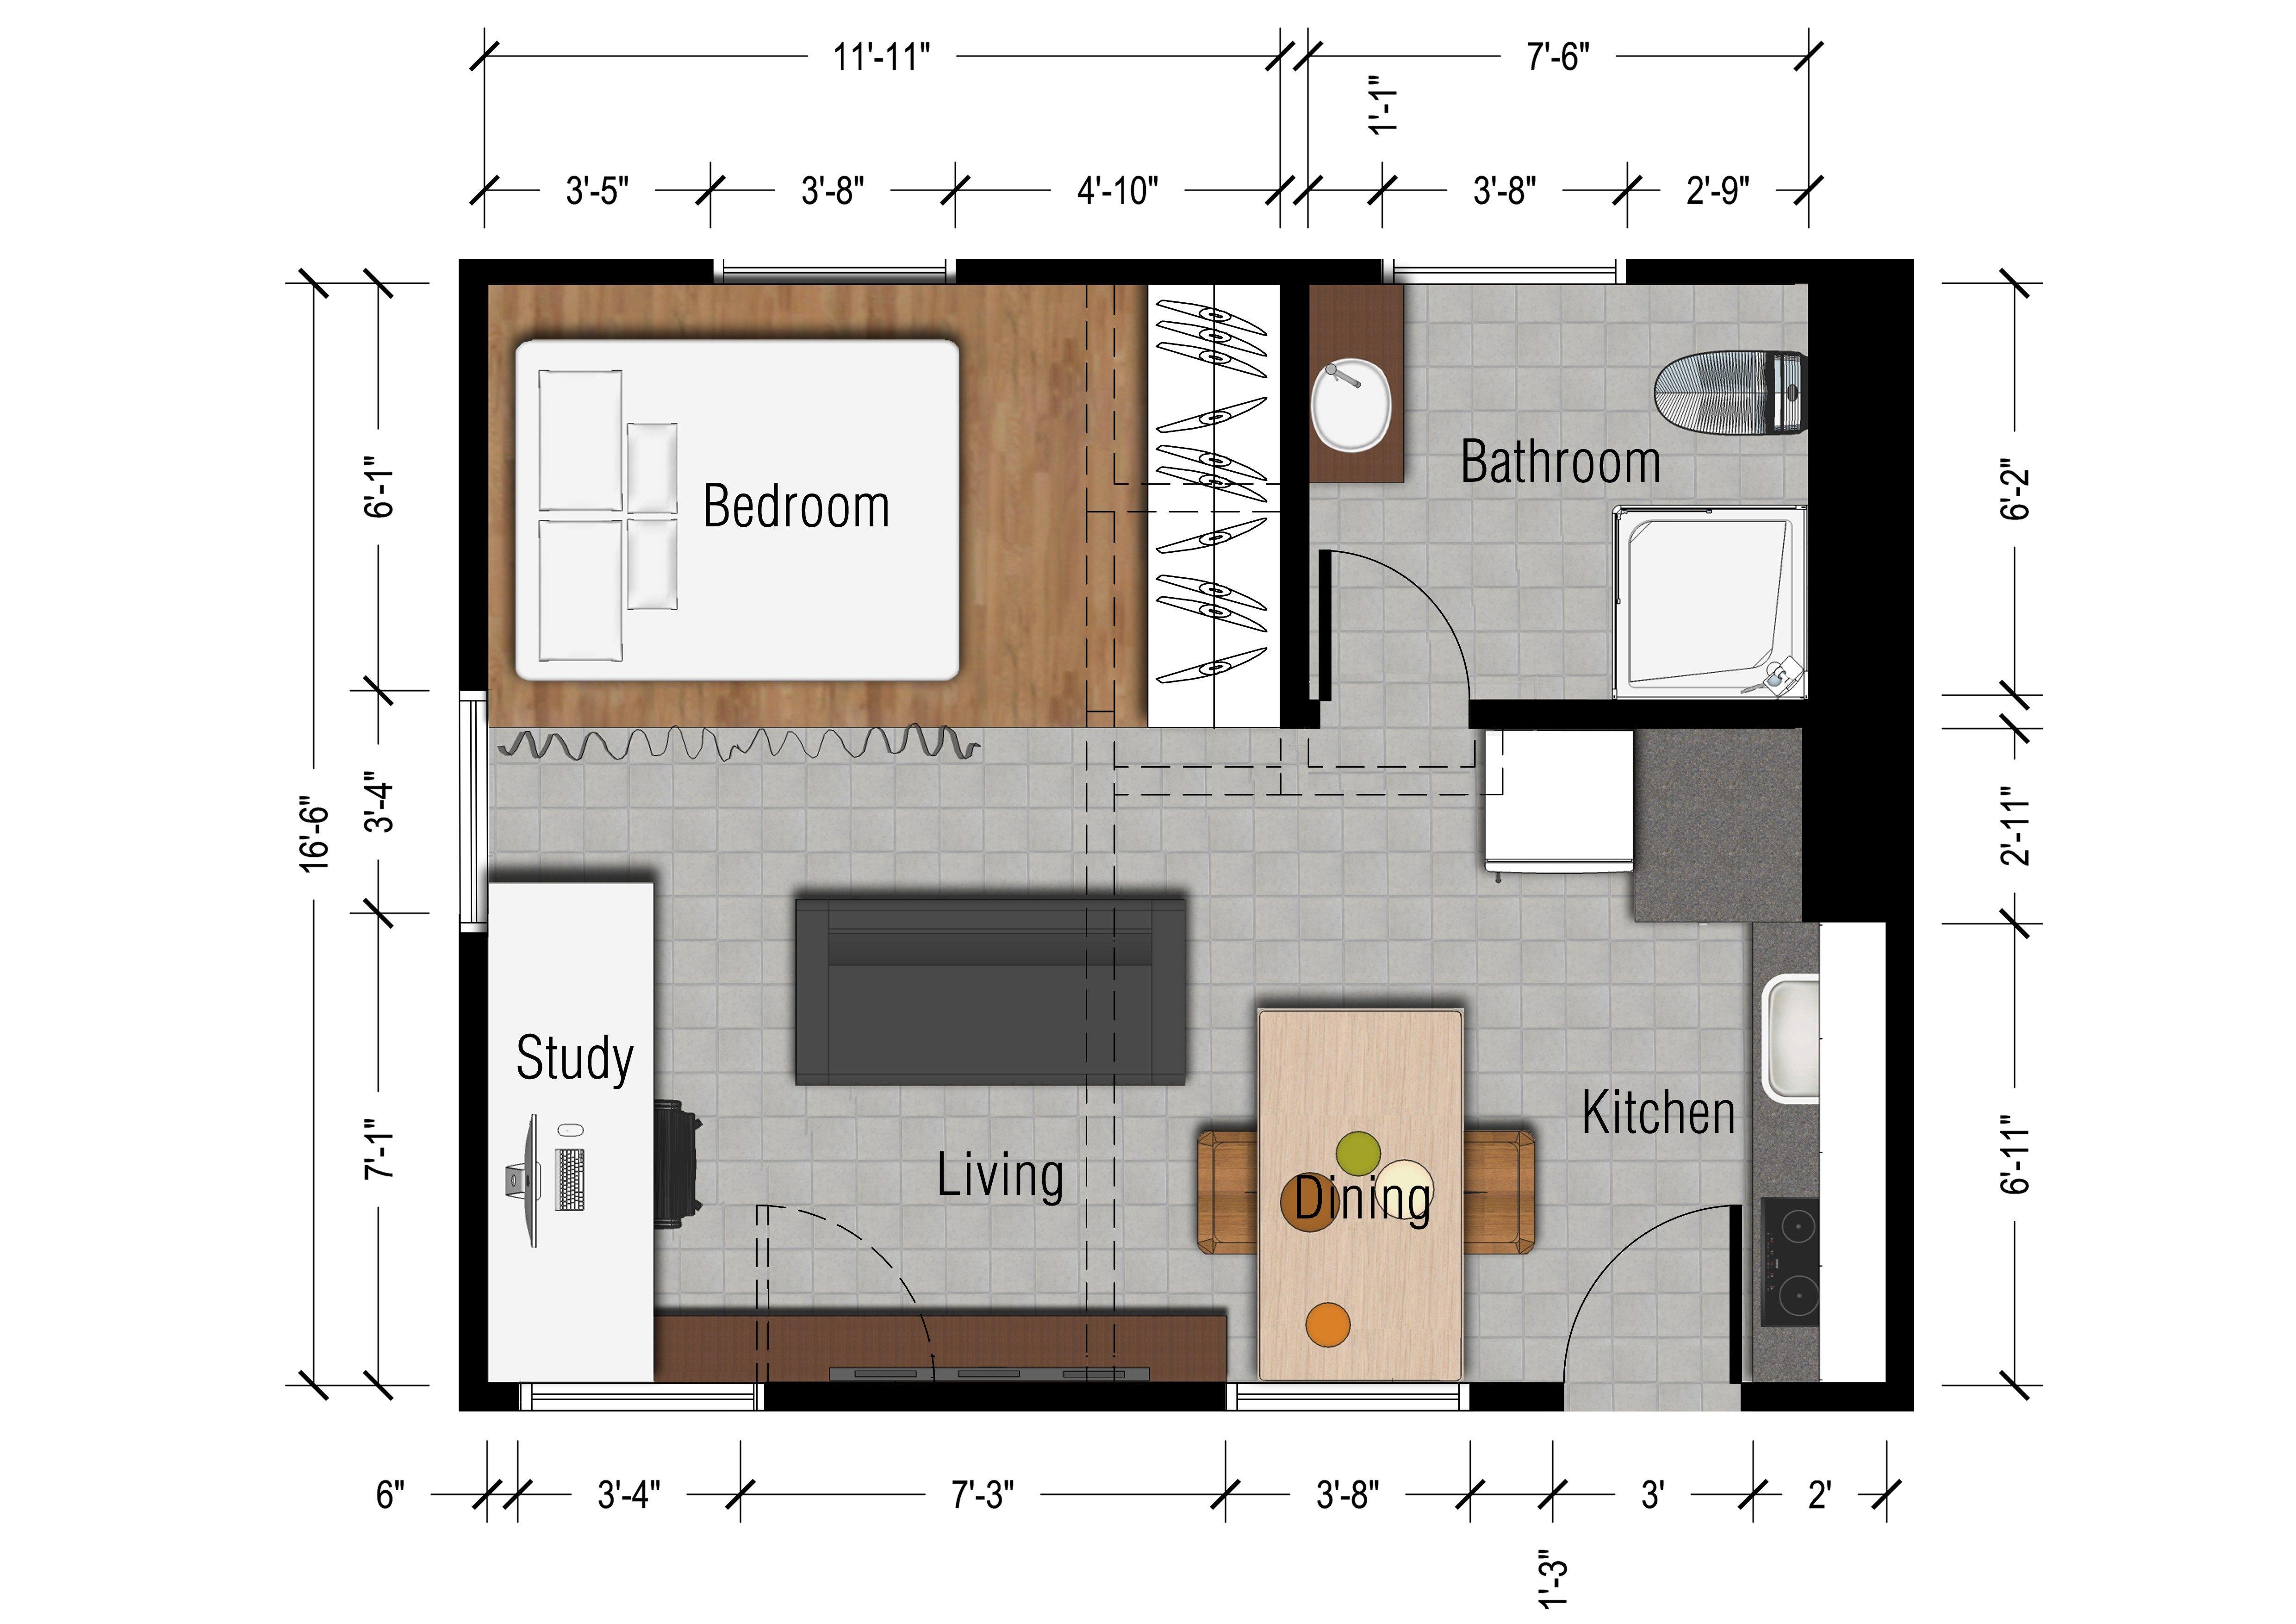 1 Bedroom Basement Apartment Floor Plans Small Apartment Plans Studio Apartment Floor Plans Studio Apartment Plan